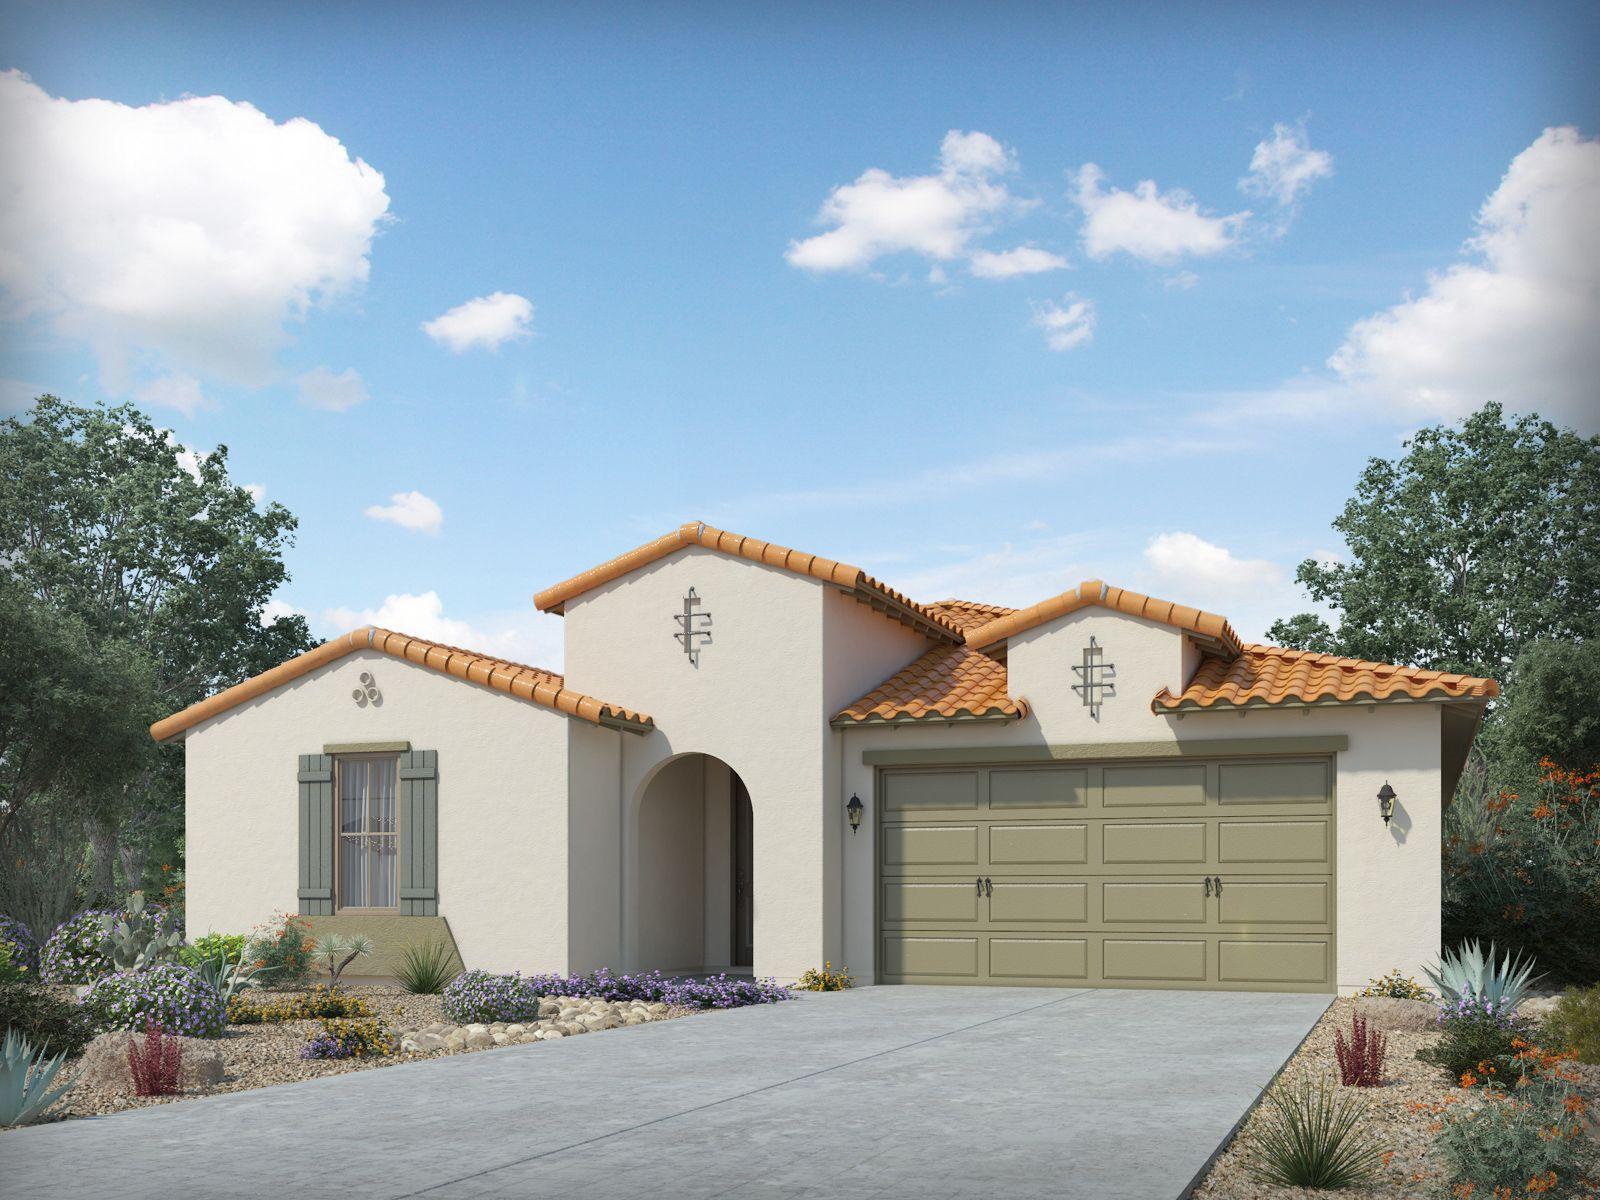 New Homes for Sale Goodyear Arizona